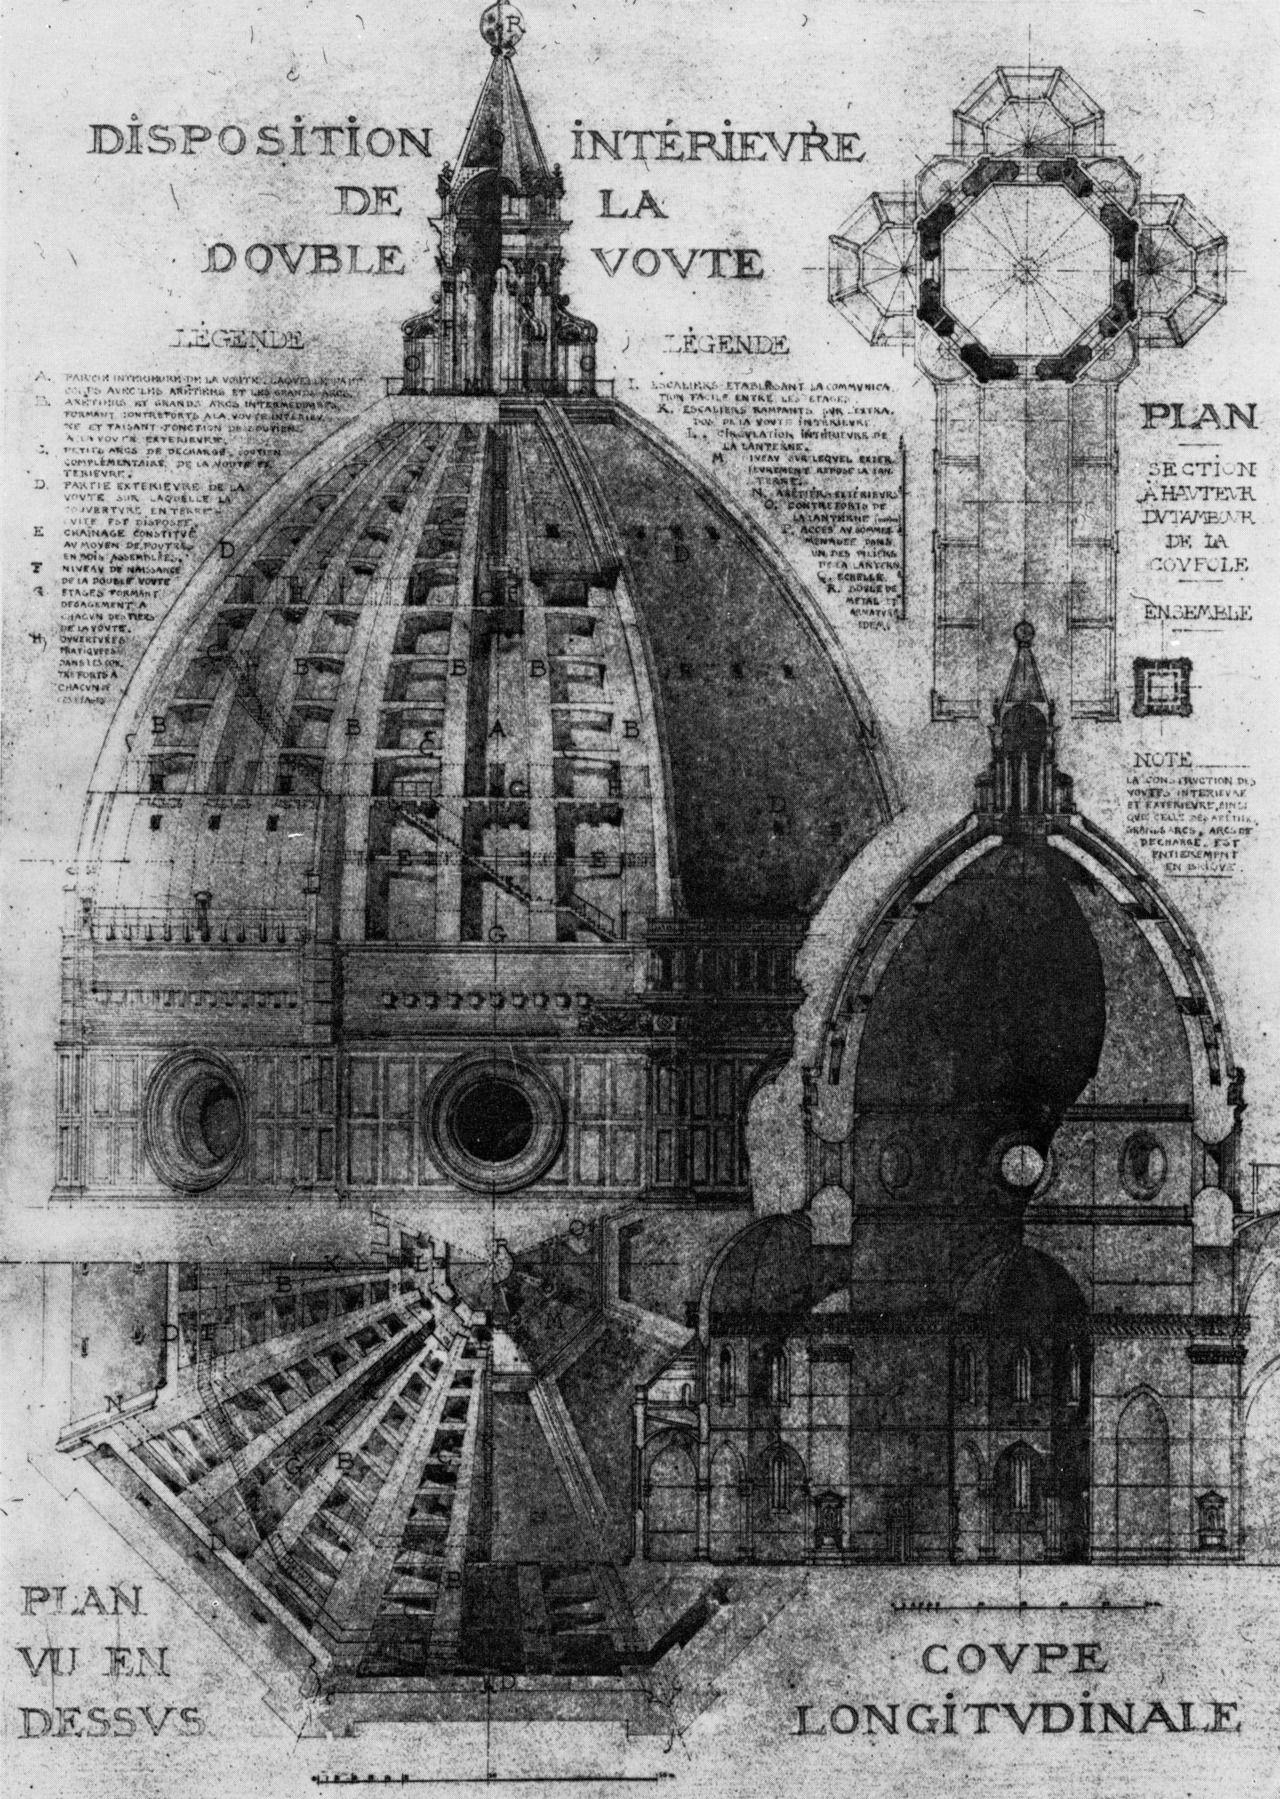 Architainment Santa Maria Del Fiore Cupola Schematic Plan And View Eugéne Duchesne Moy Schizzi D Architettura Disegno Di Architettura Architettura Storica